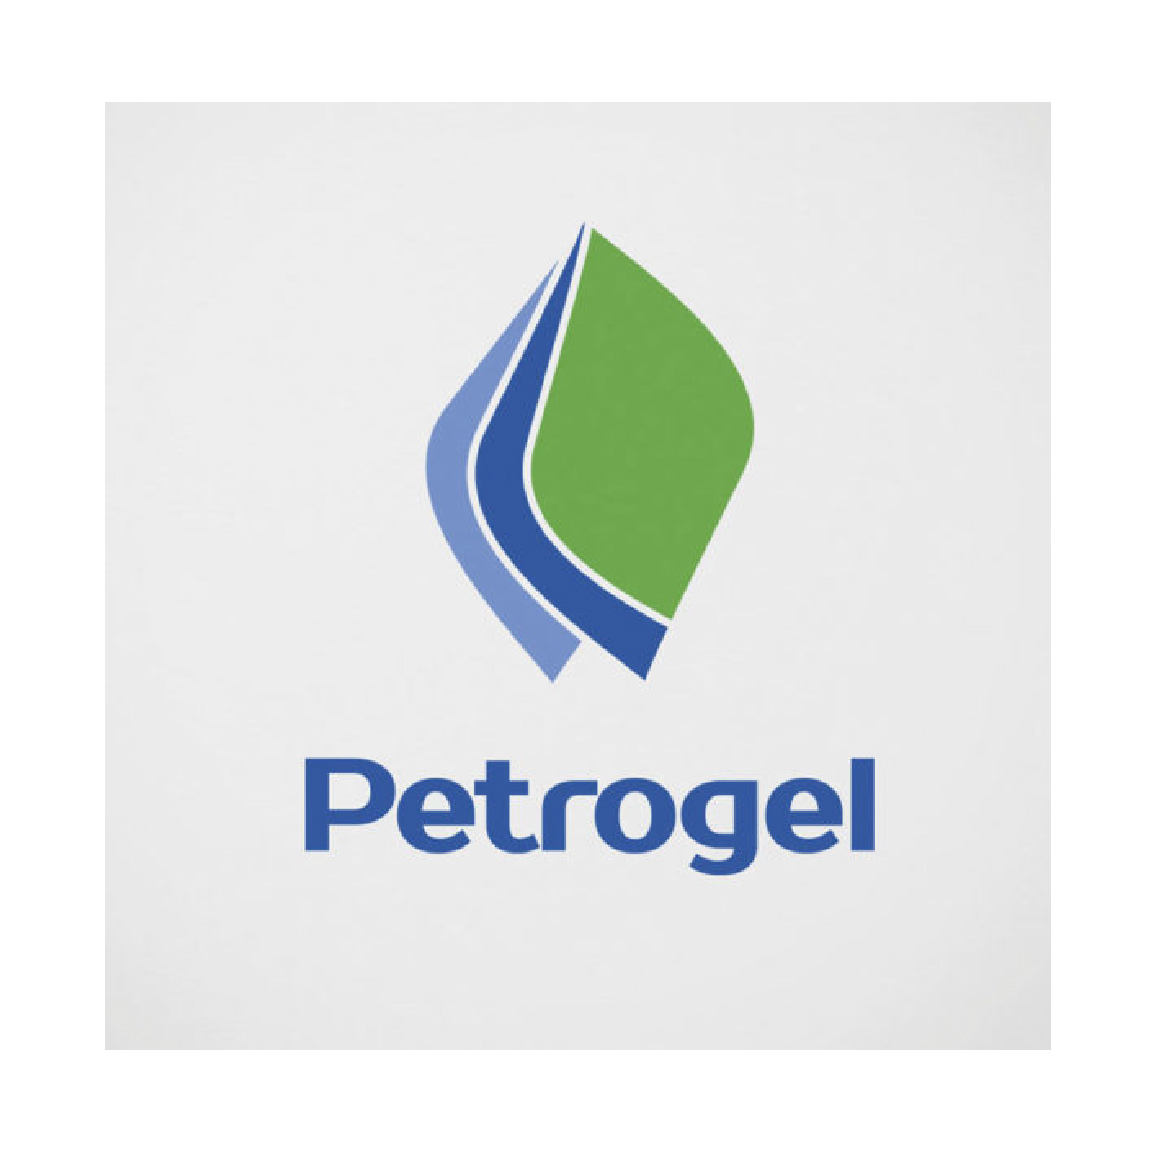 Petrogel